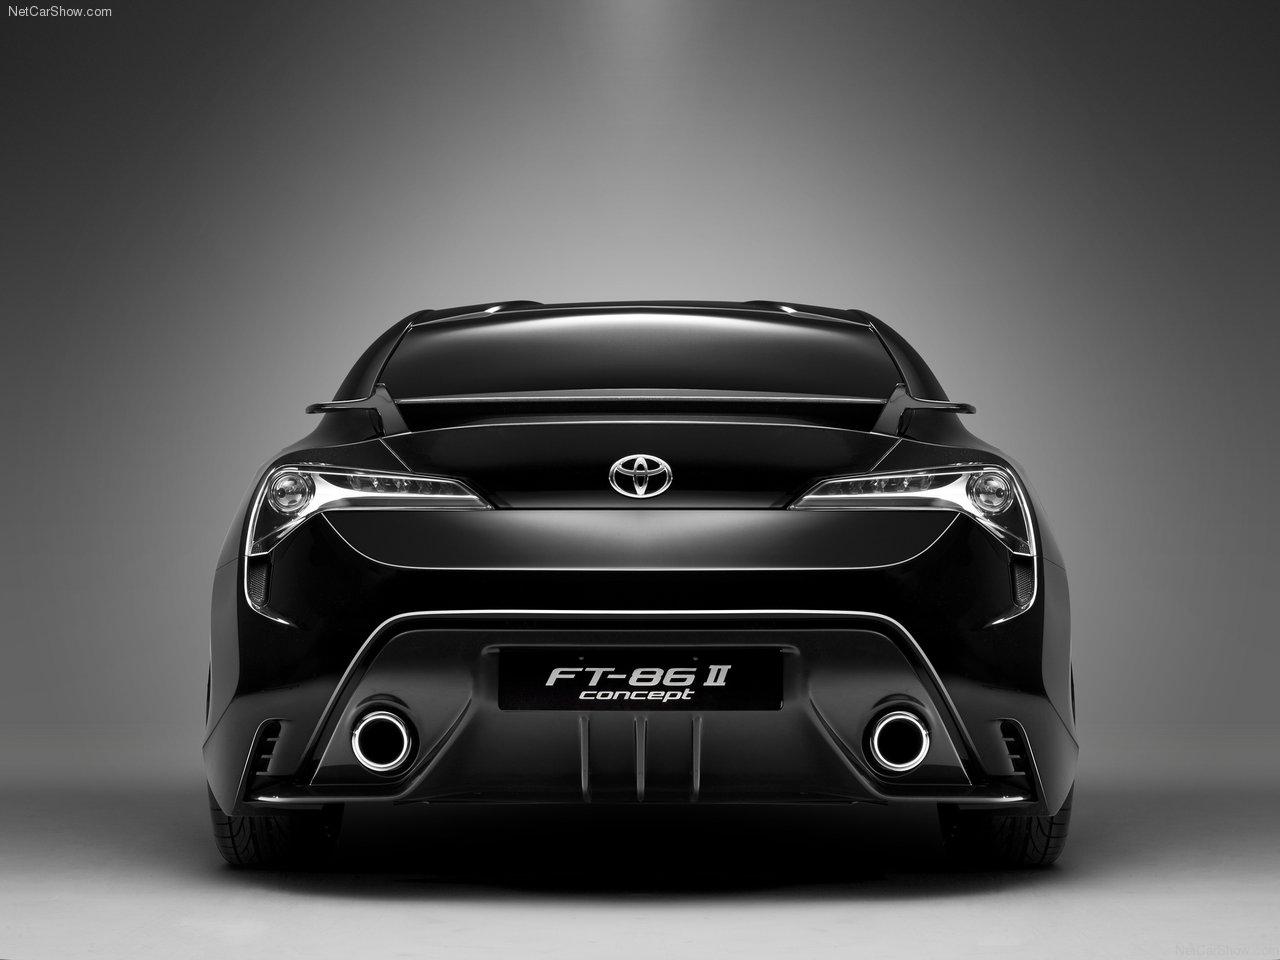 https://2.bp.blogspot.com/-UixBH2BLwzY/TWzAOAH7IyI/AAAAAAAALe4/H9PKnTskUdQ/s1600/Toyota-FT-86_II_Concept_2011_1280x960_wallpaper_05.jpg